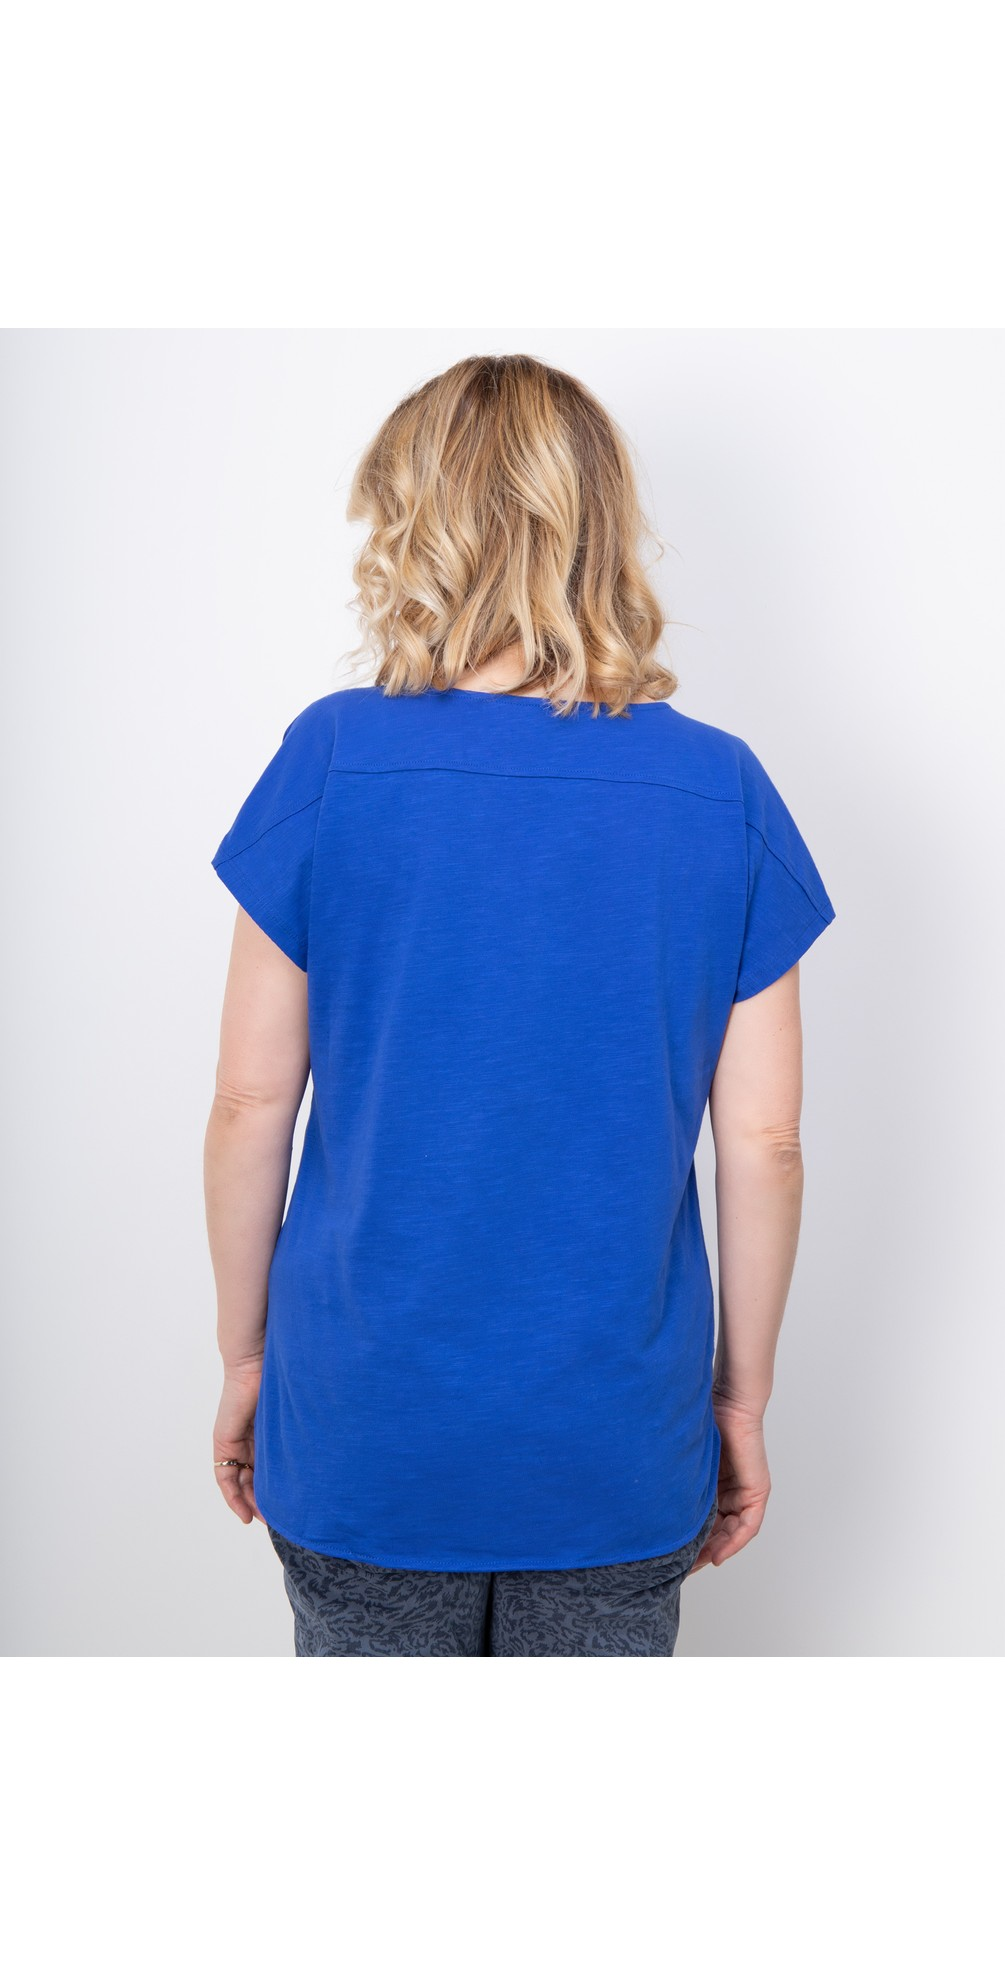 Short Sleeve V-neck Top main image